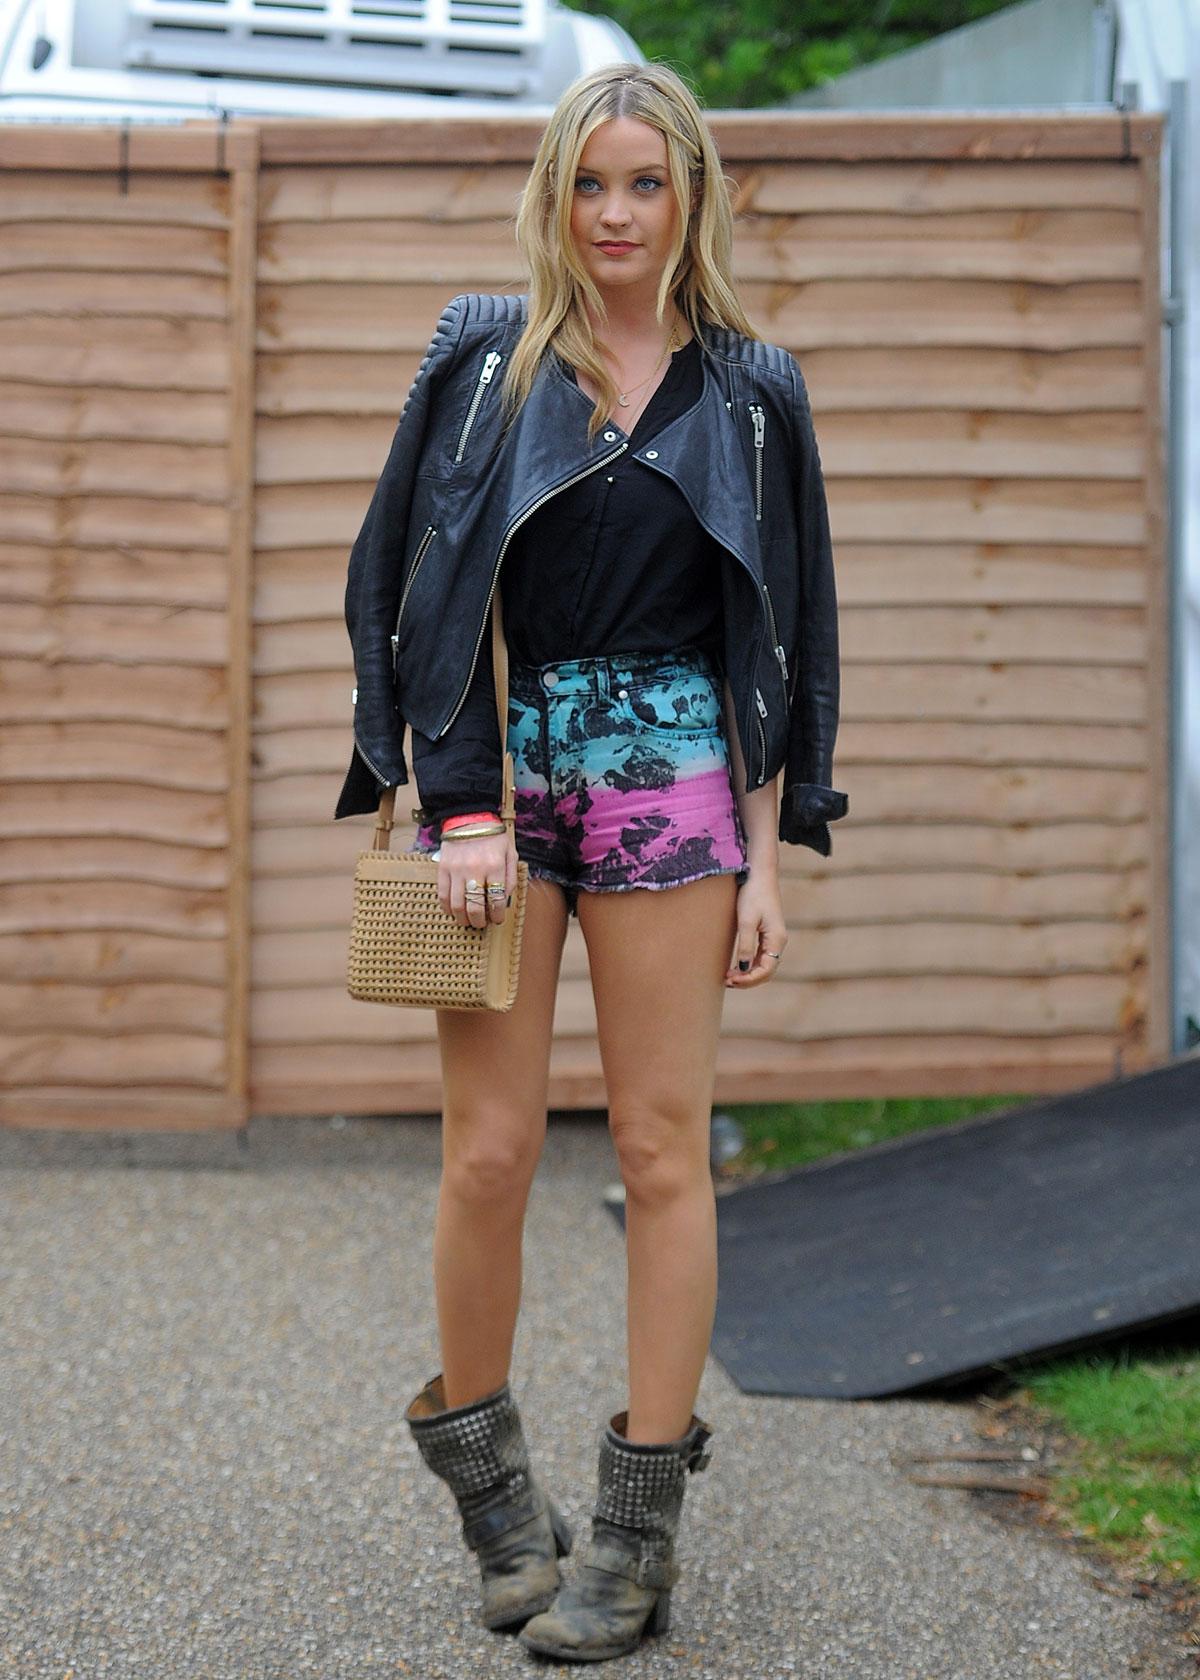 Laura Whitmore attends Wireless Festival